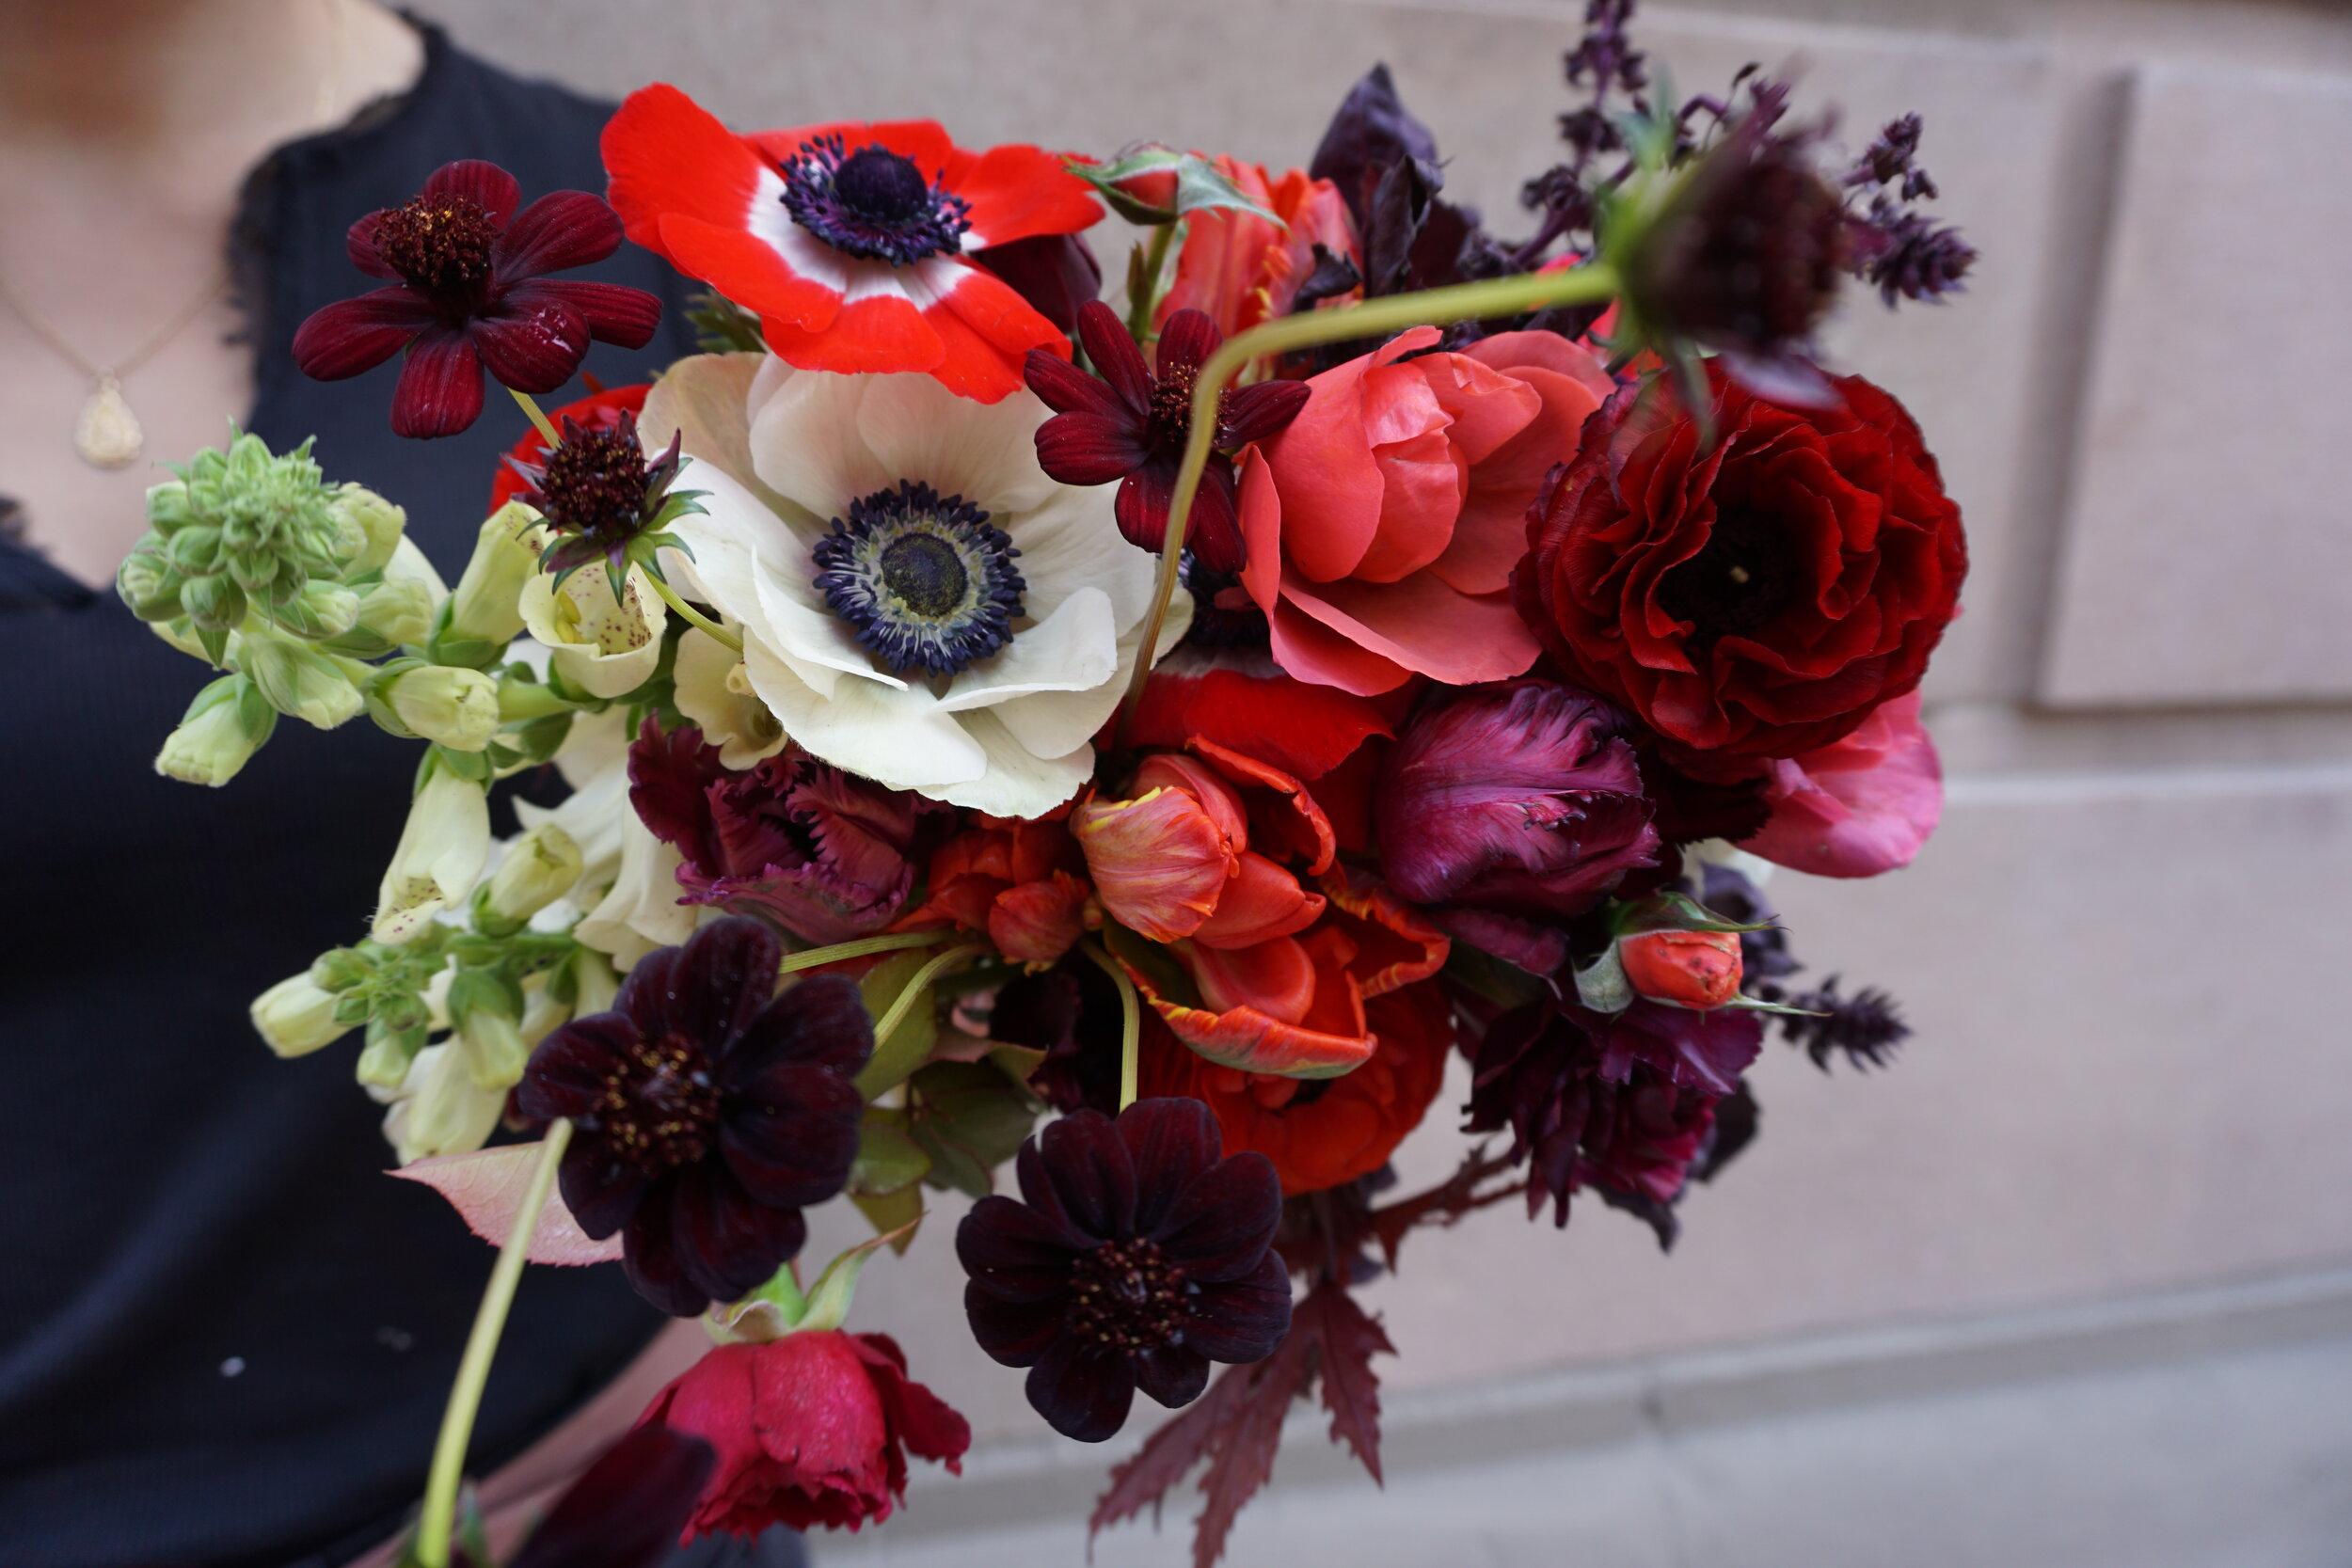 Botanicamuse by Madeleine Shelton San Diego Wedding event designer florist The Guild